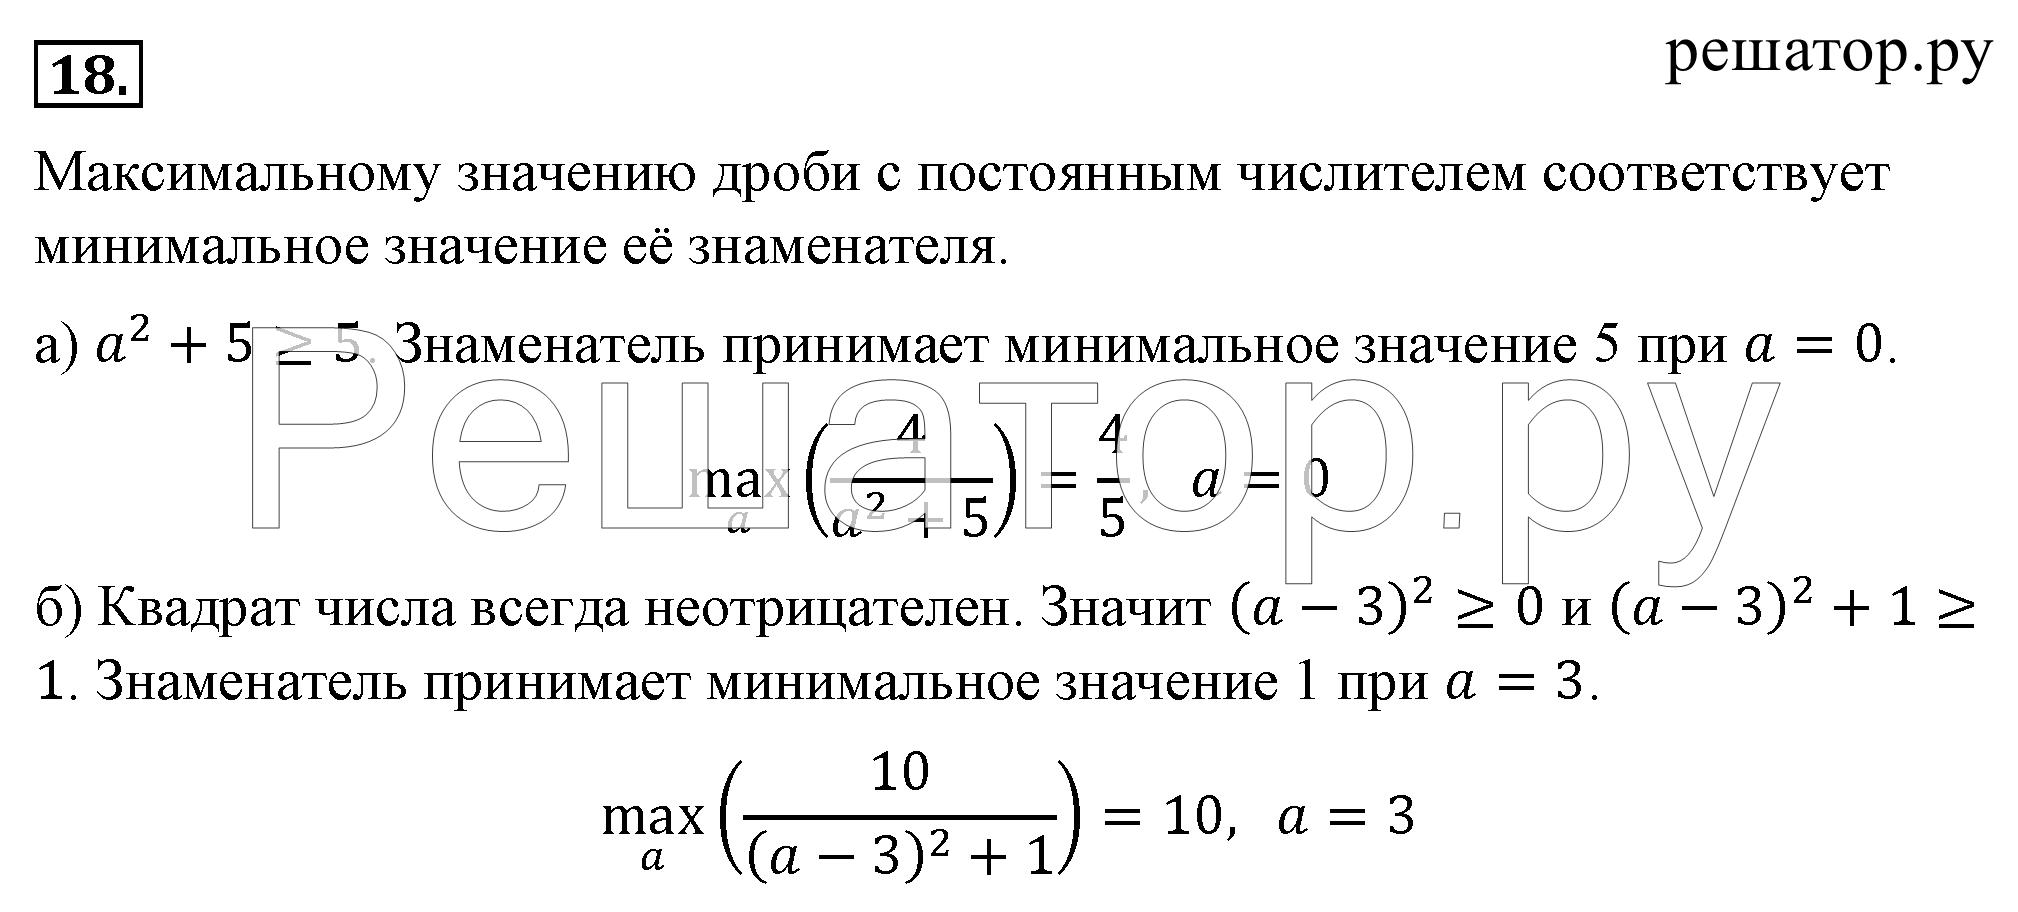 Гдз по алгебре 9 класс макарычев миндюк нешков суворова 2018 онлайн